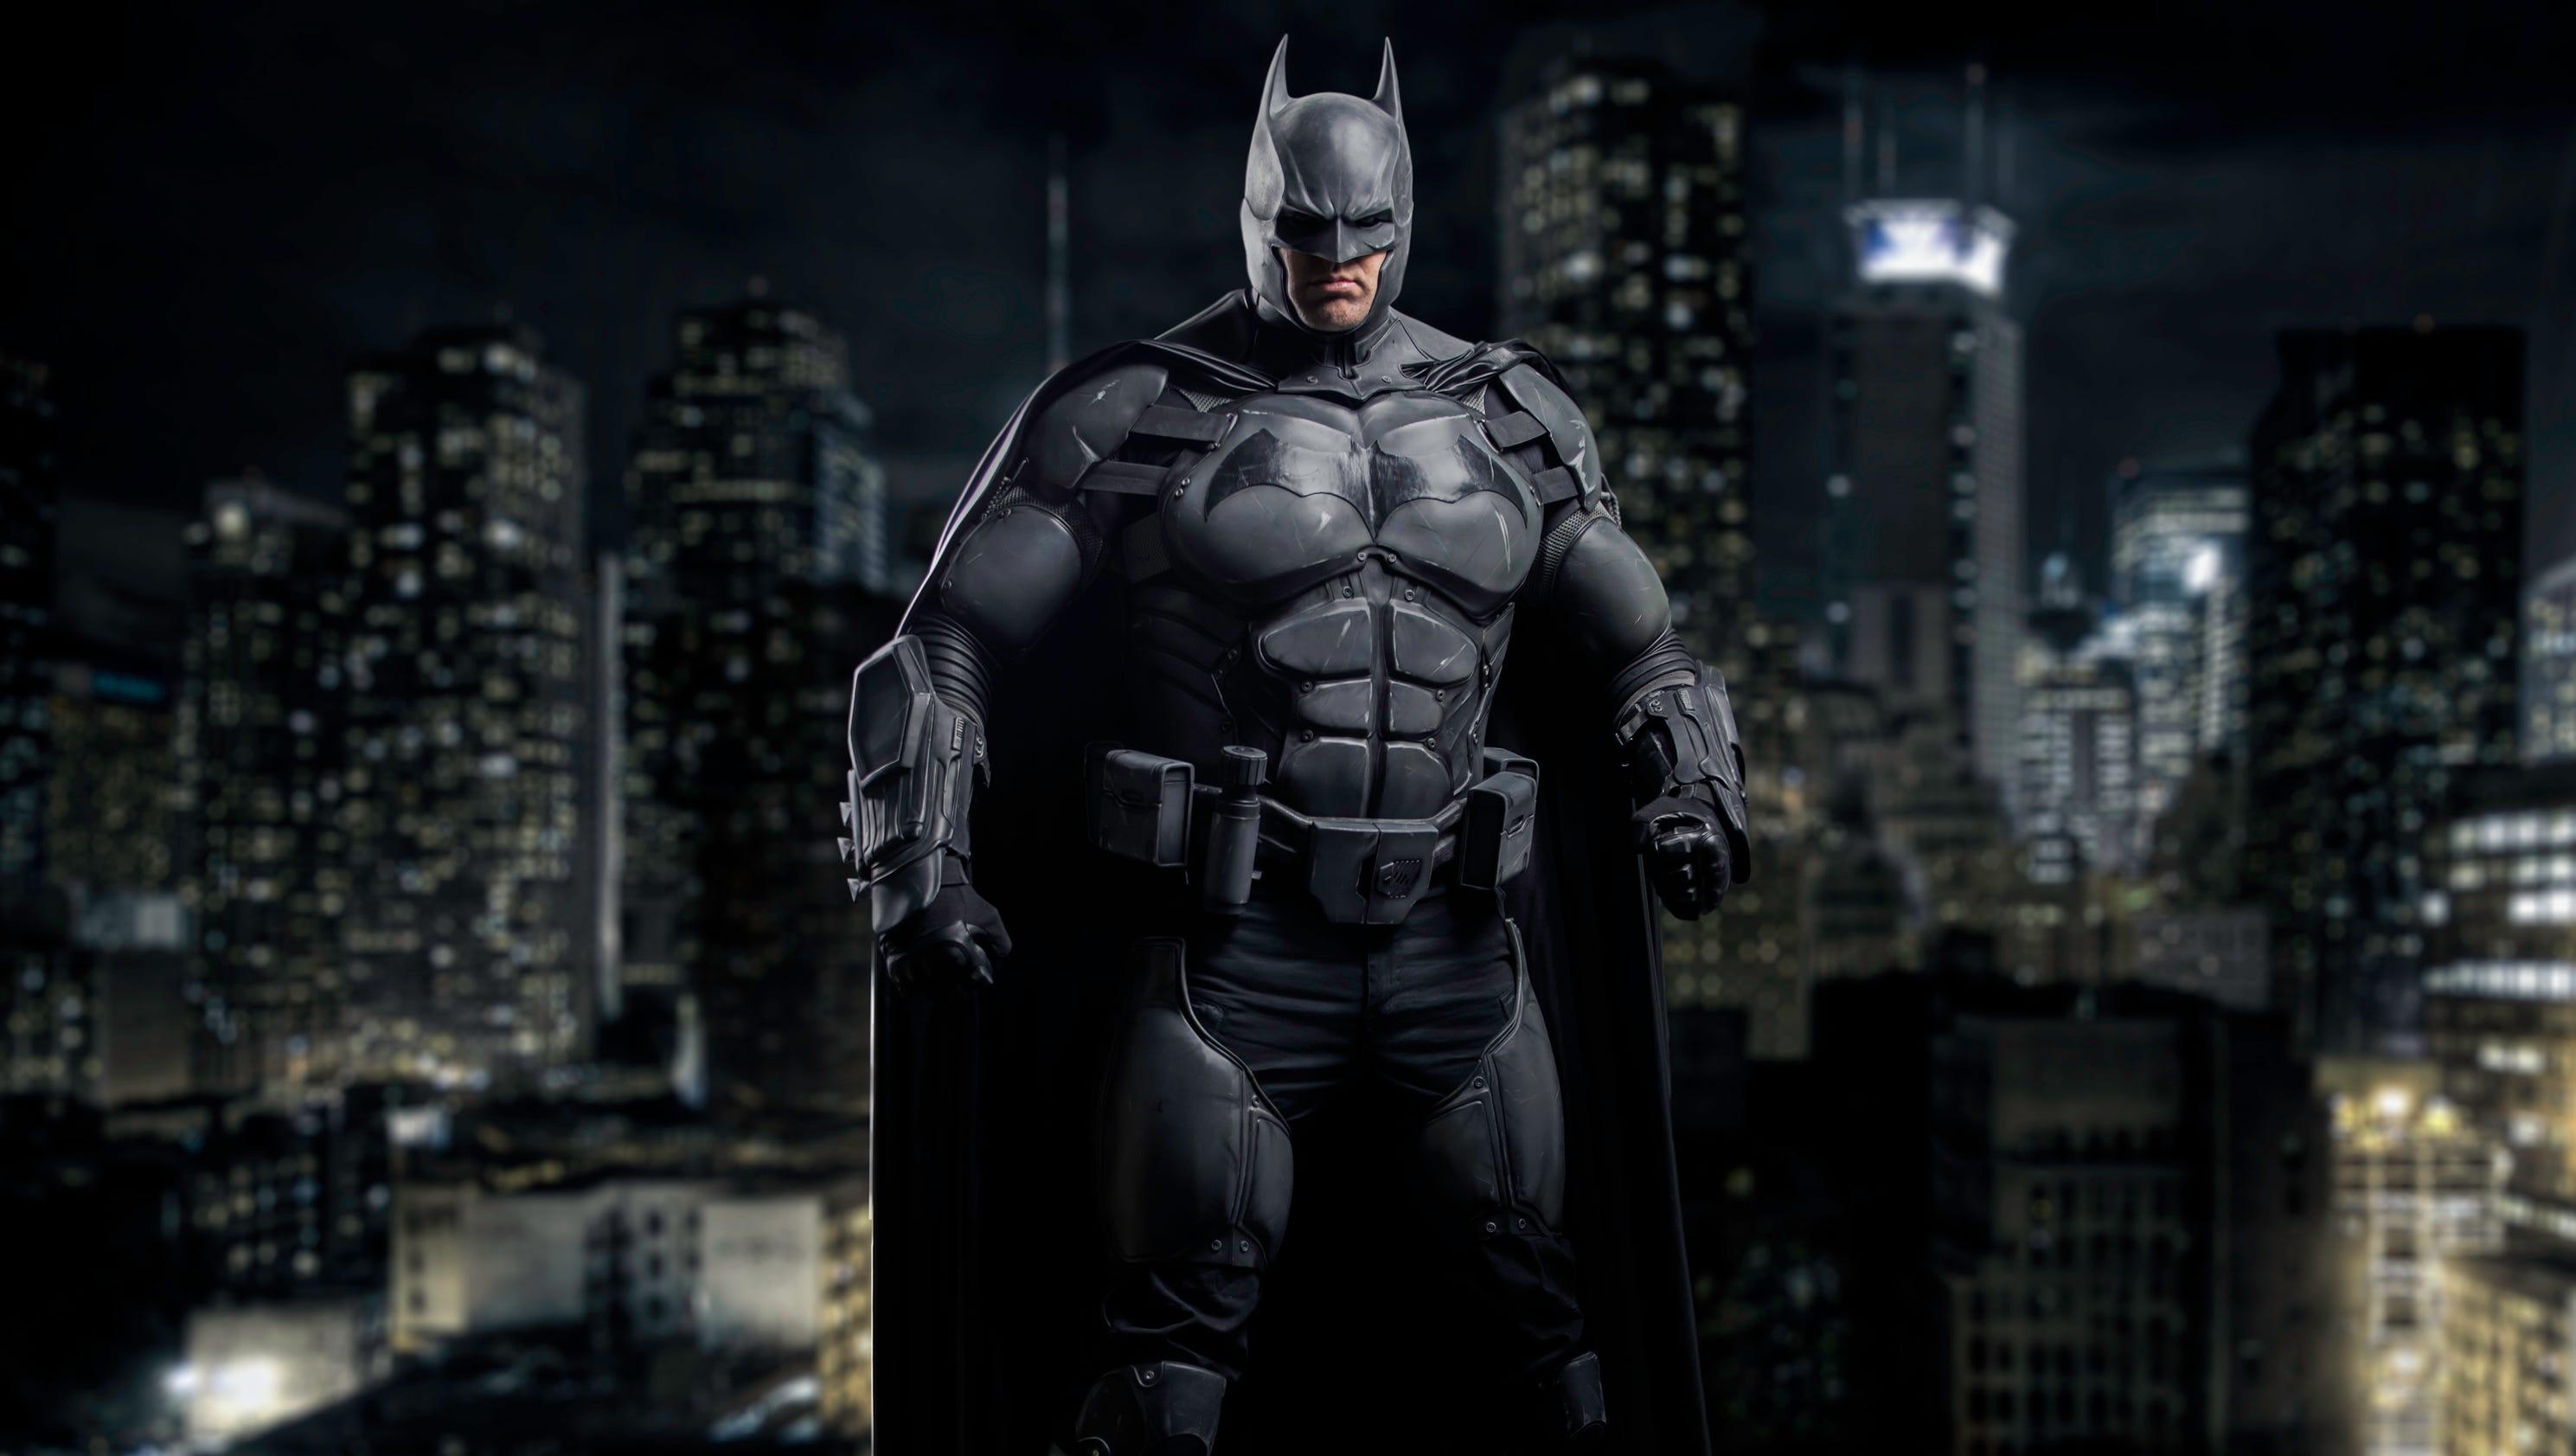 Record-breaking batsuit features 23 gadgets